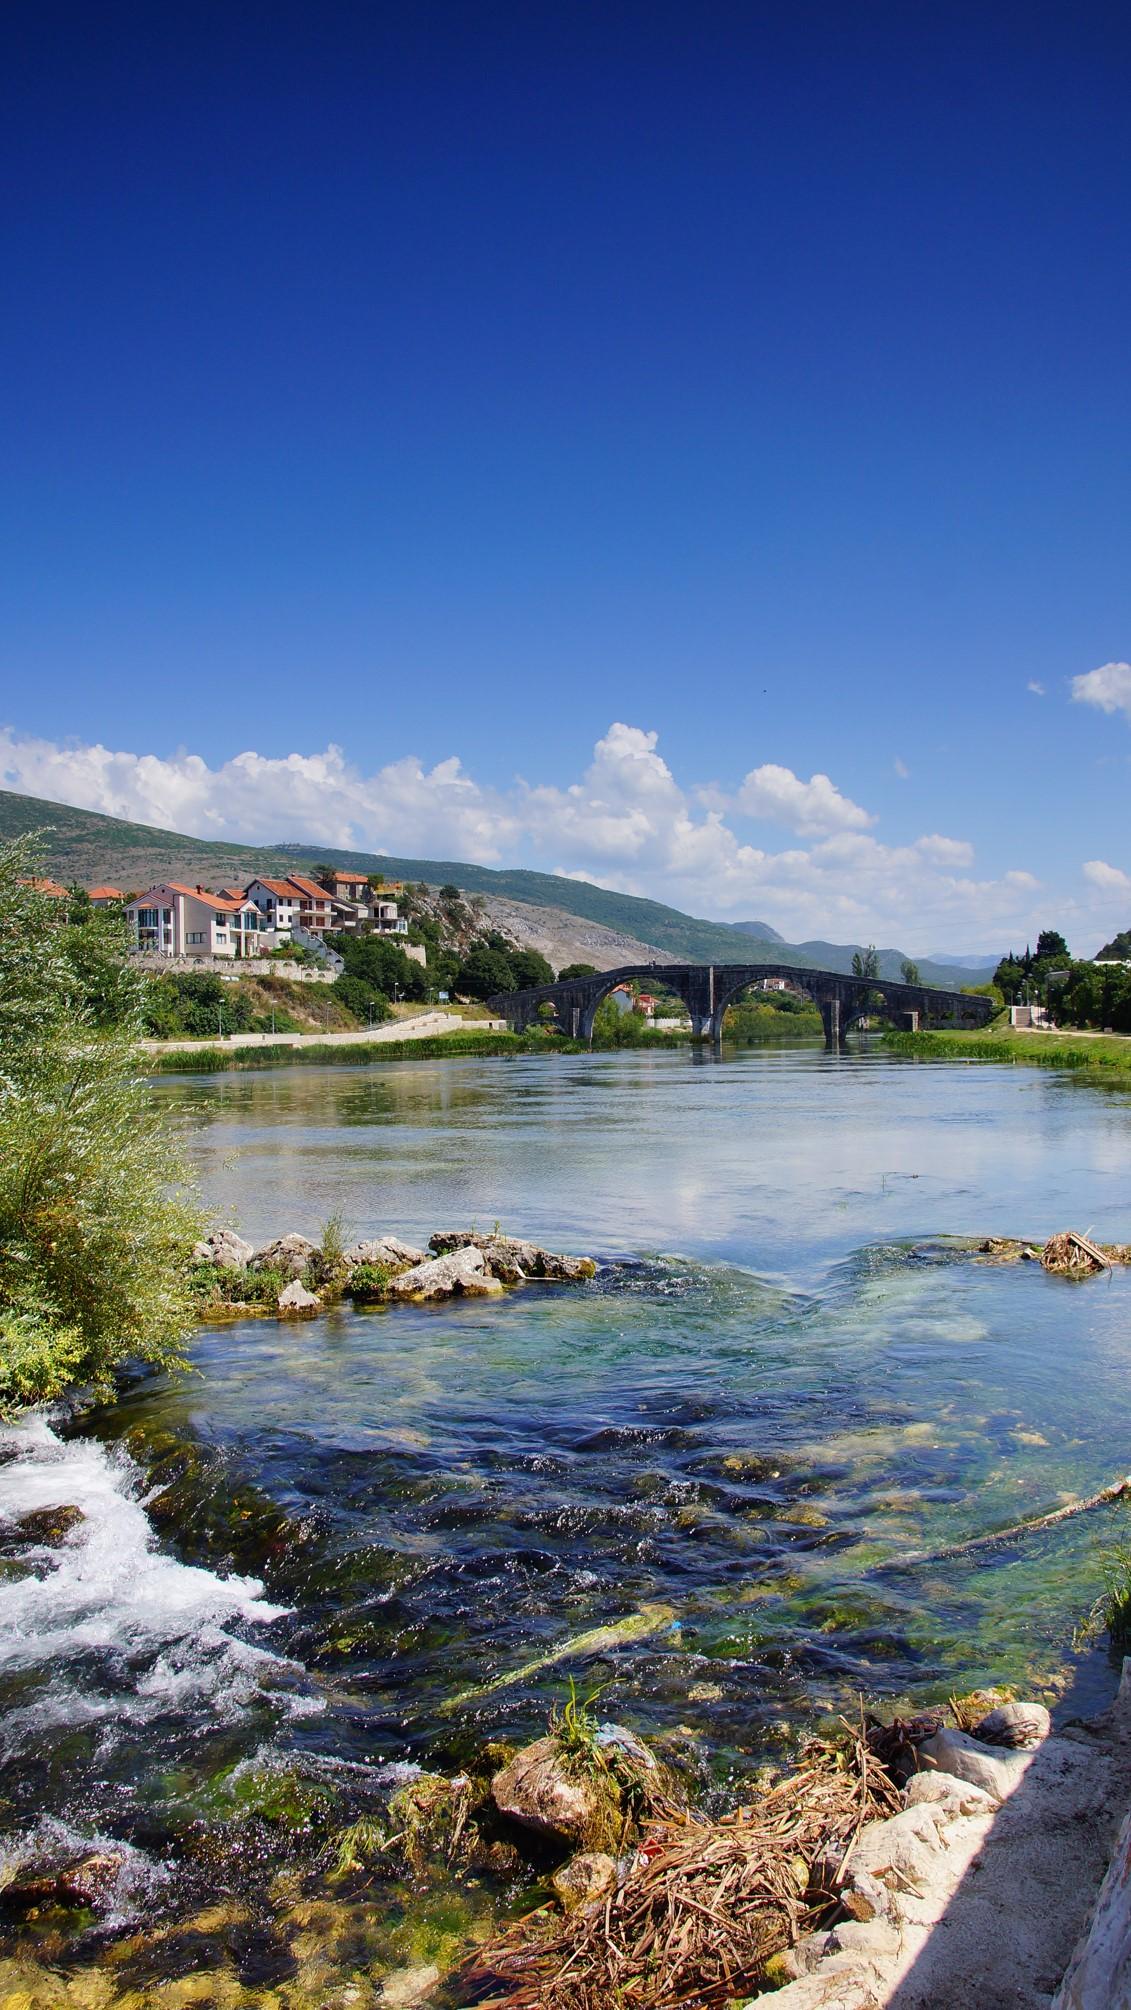 Arslanagić Bridge, Trebinje, Bośnia i Hercegowina